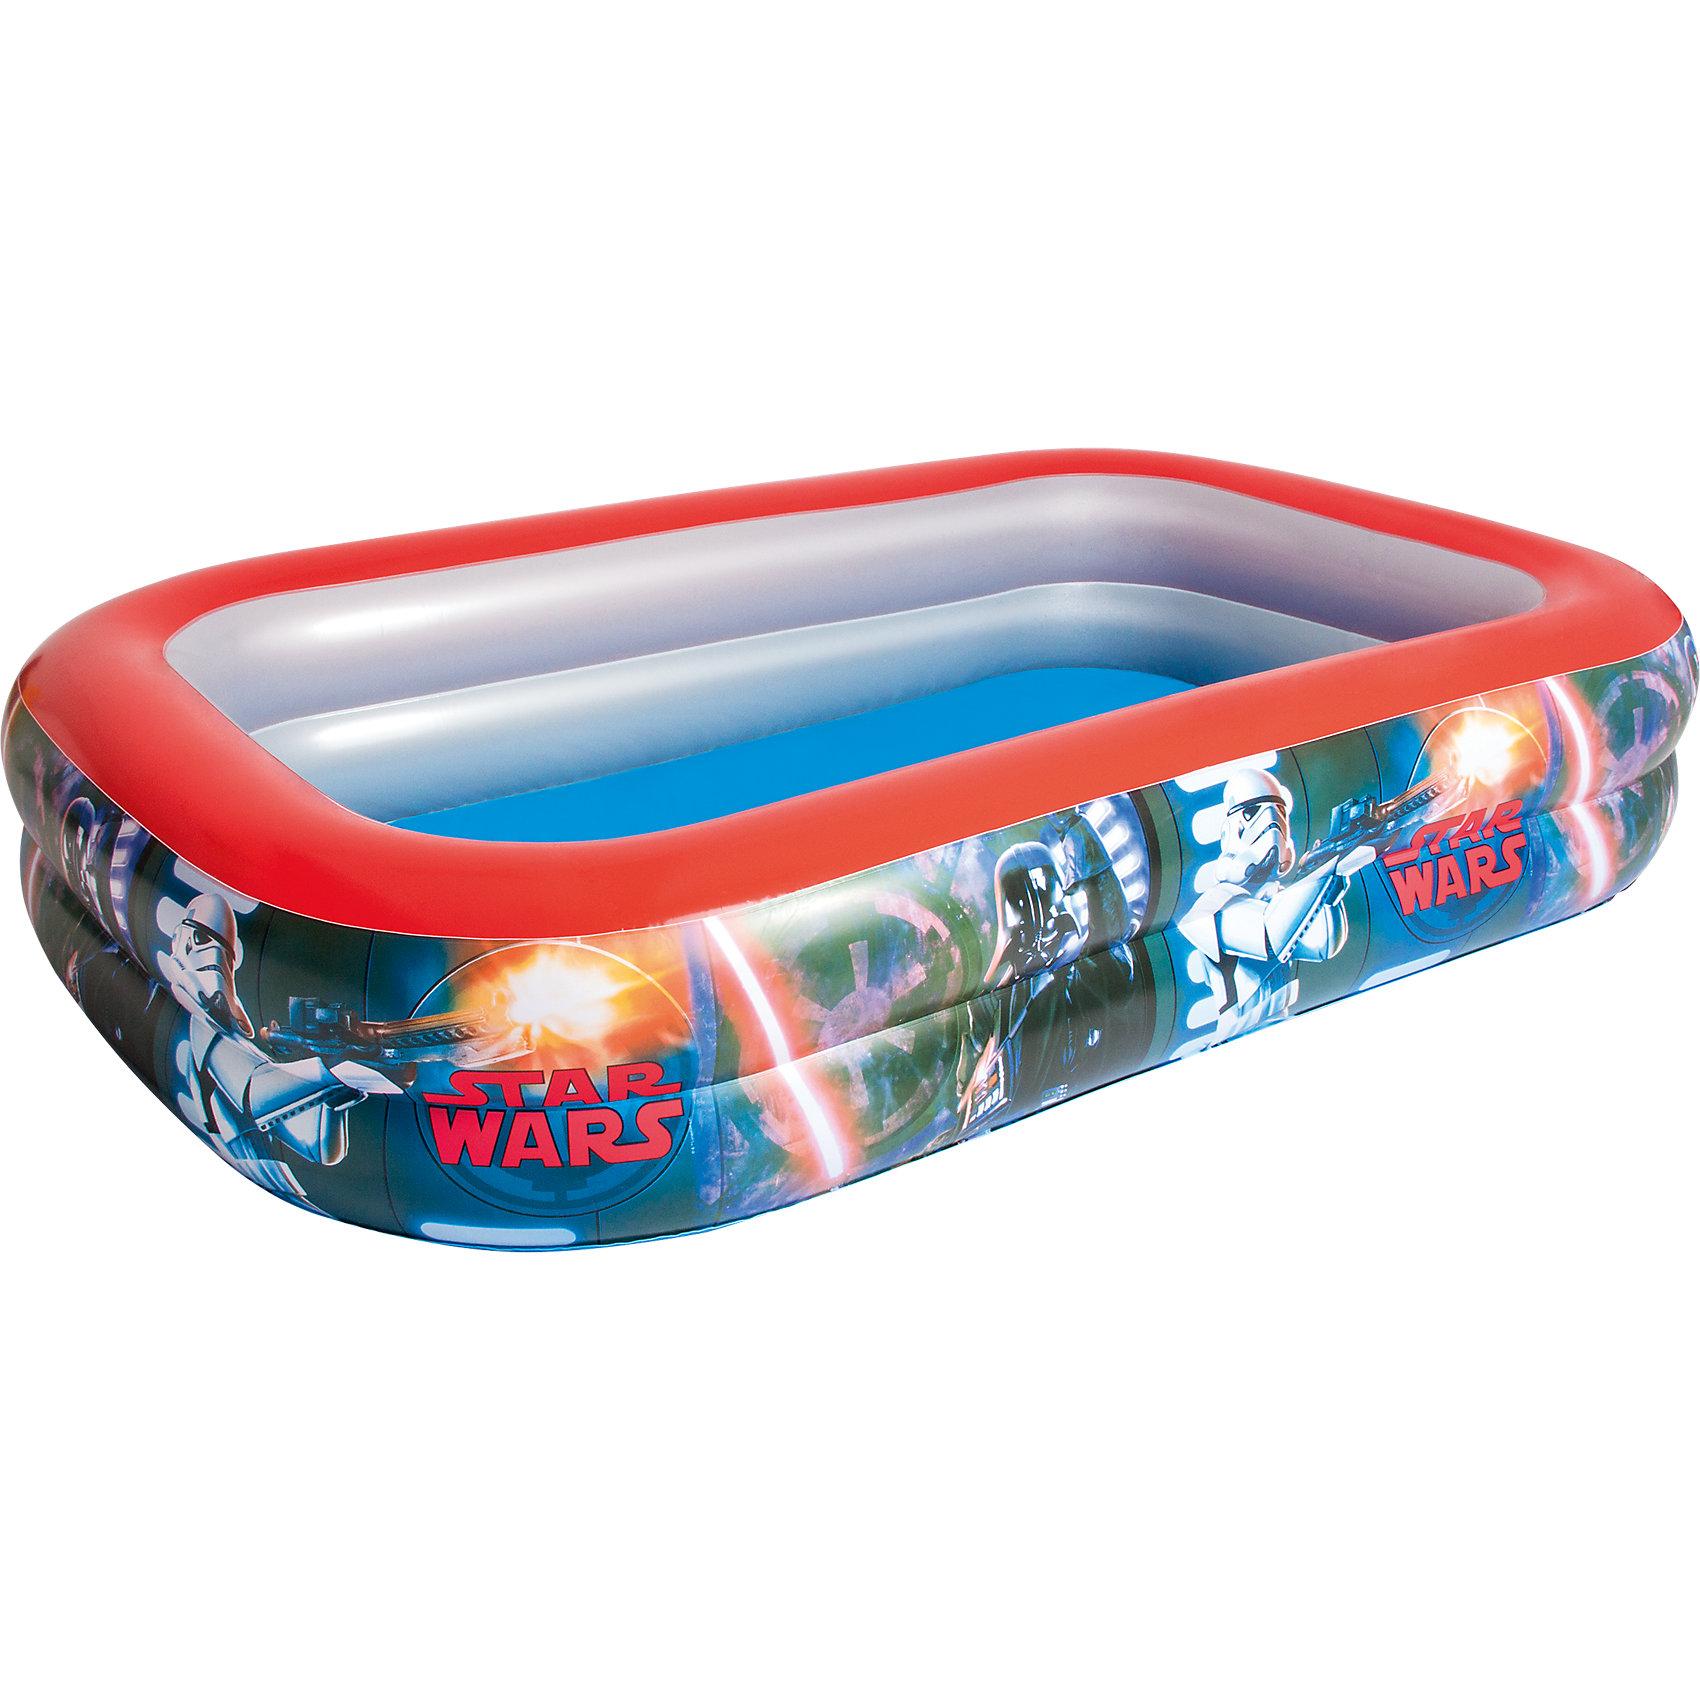 Bestway Прямоугольный бассейн Звёздные войны, Bestway бассейн tom jerry bestway 61х15 см bw93043